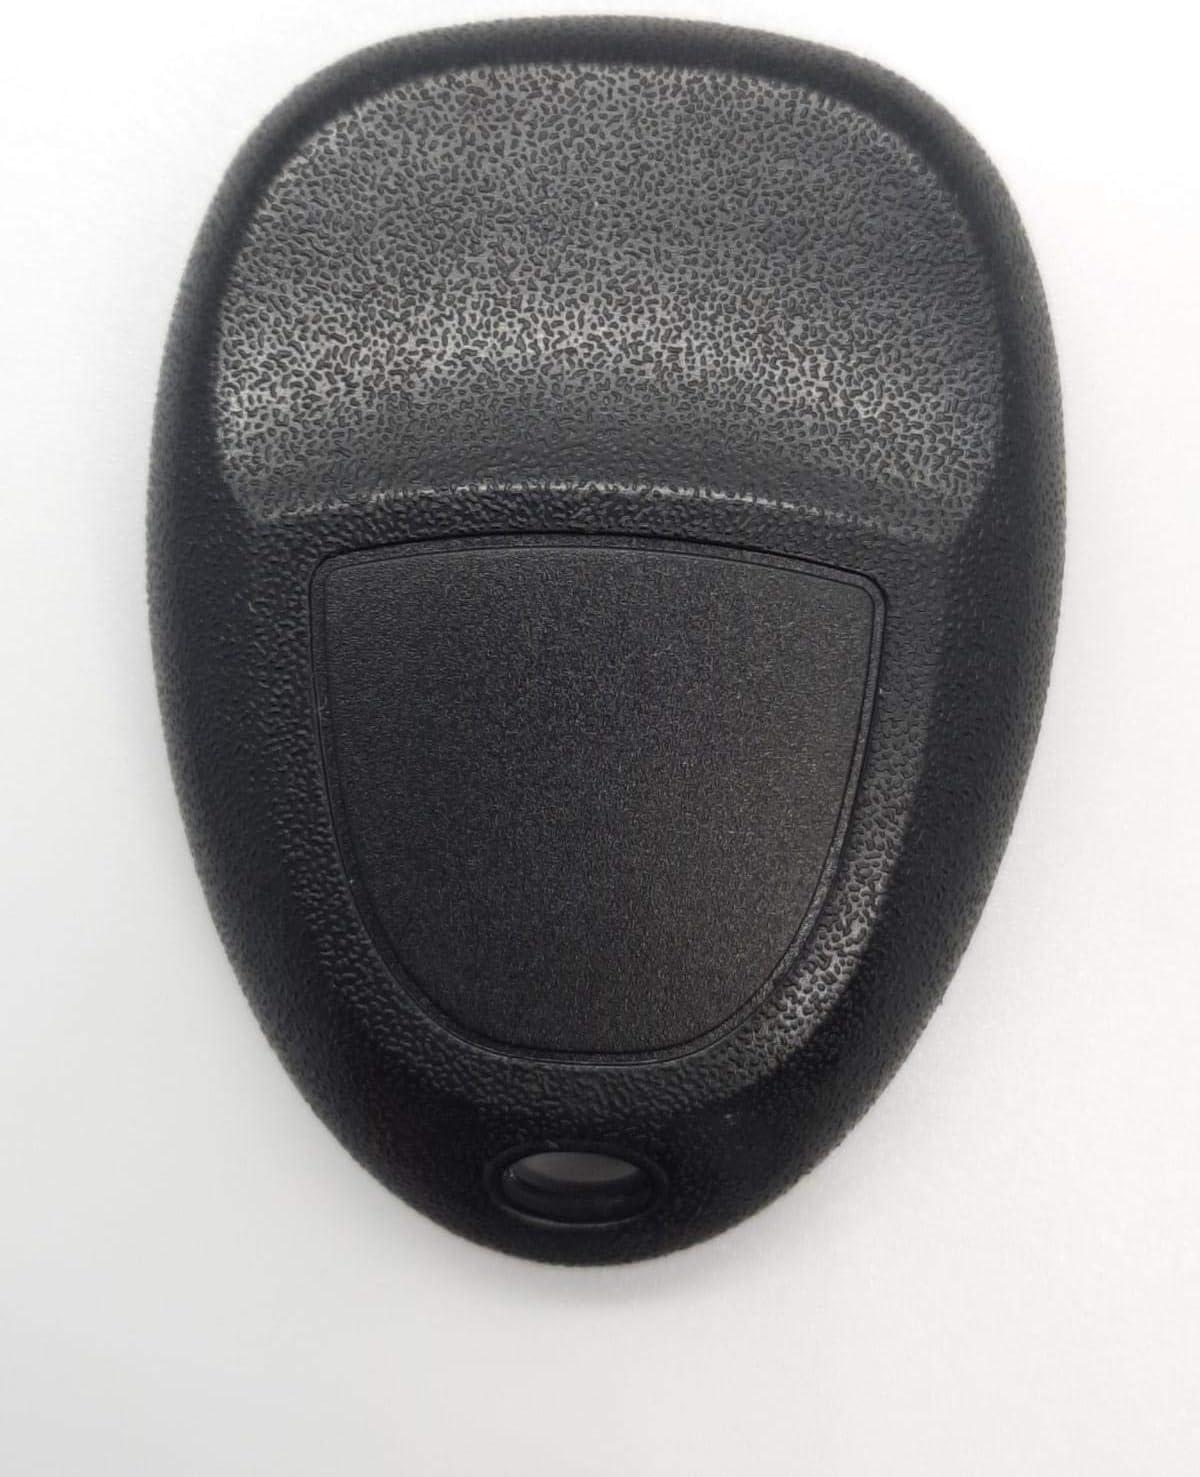 Tahoe 2007-2014 Traverse 2012-2017 Cadillac Escalade 2007-2014 GMC Yukon 2007-2014 2 New Car Key Fobs Keyless Entry Remote for Chevy Suburban 2007-2014